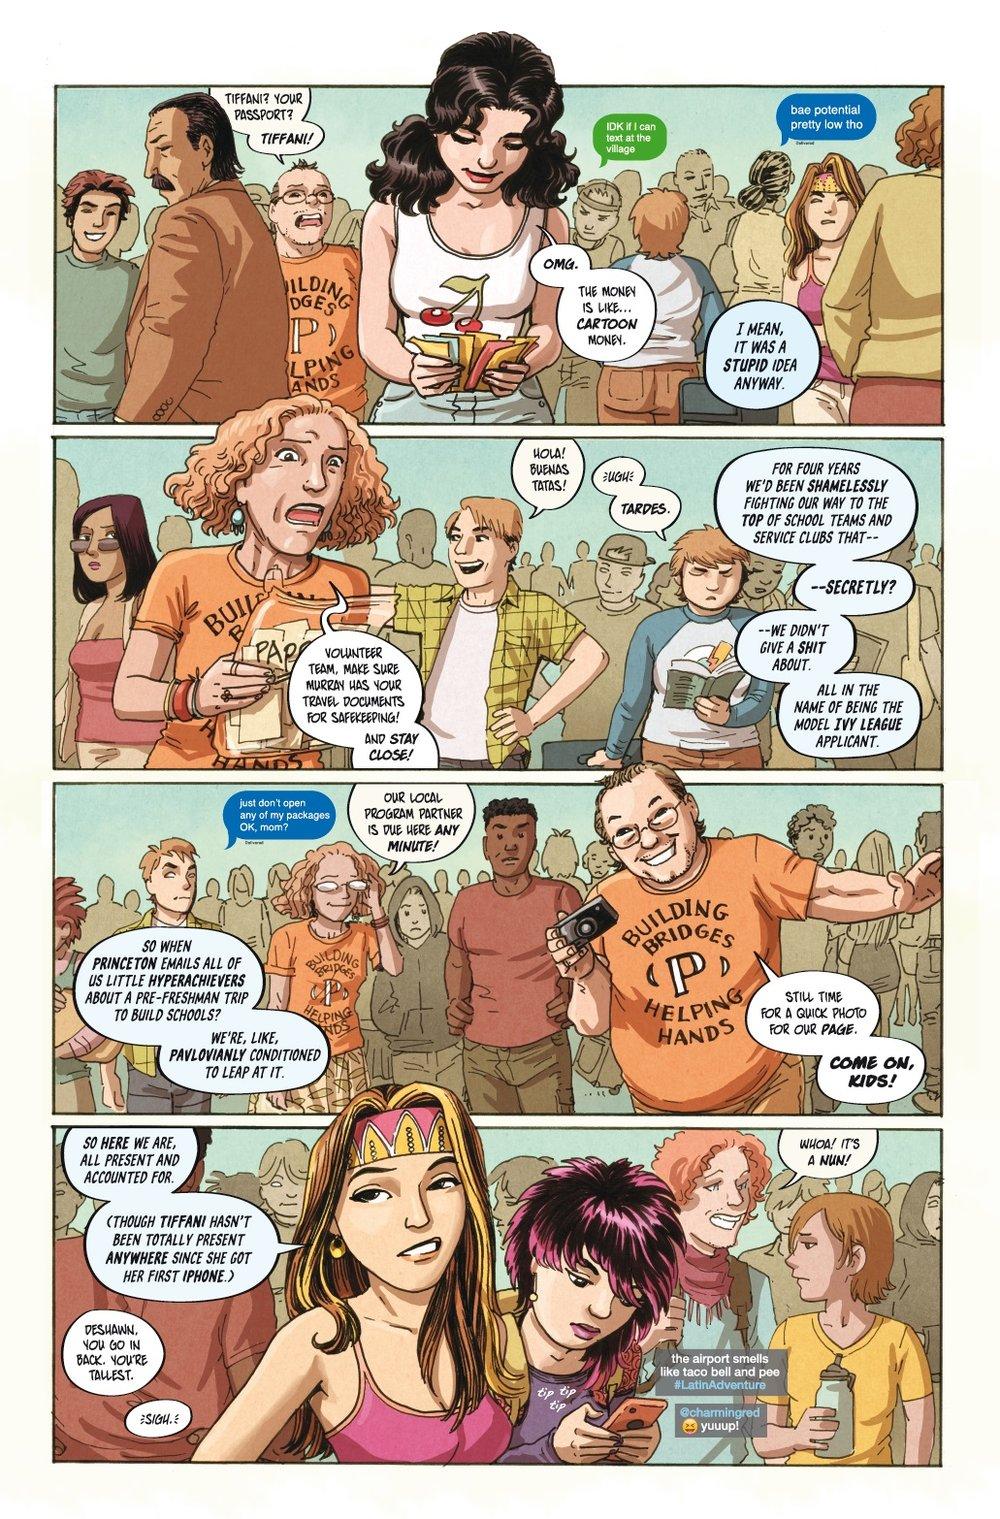 Women in comics2.jpg